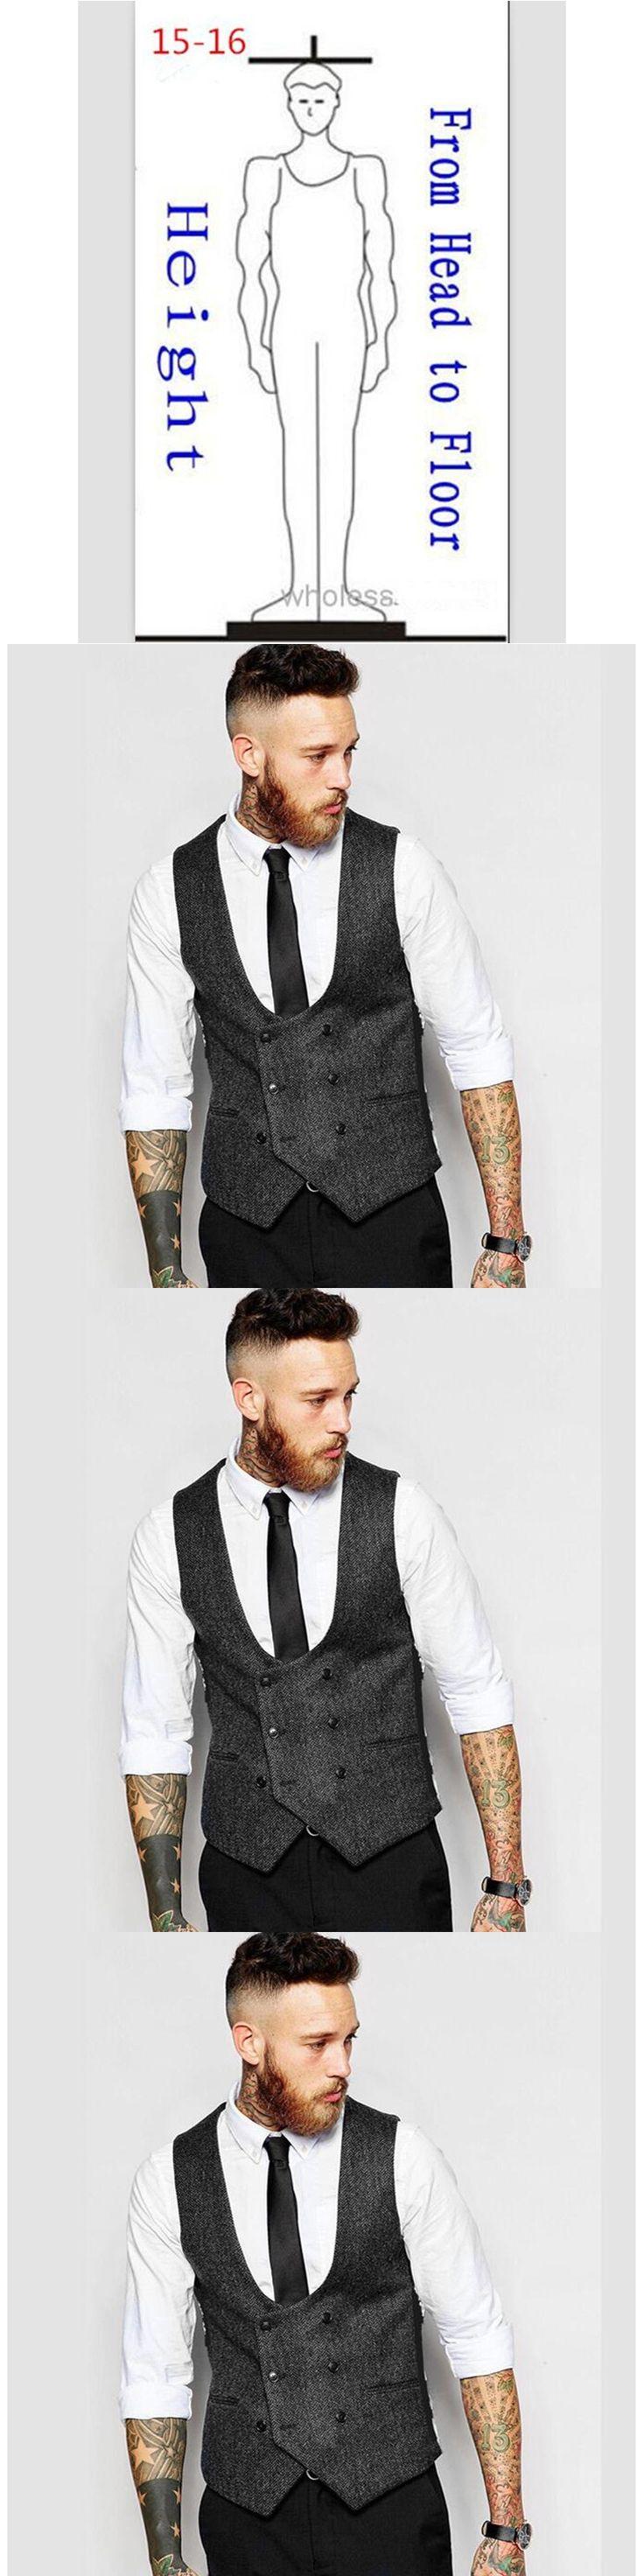 auguswu Custom Made New British Style Men's Vests Slim Woollen cloth Double Breasted Sleeveless Waistcoat Men Suit Vest